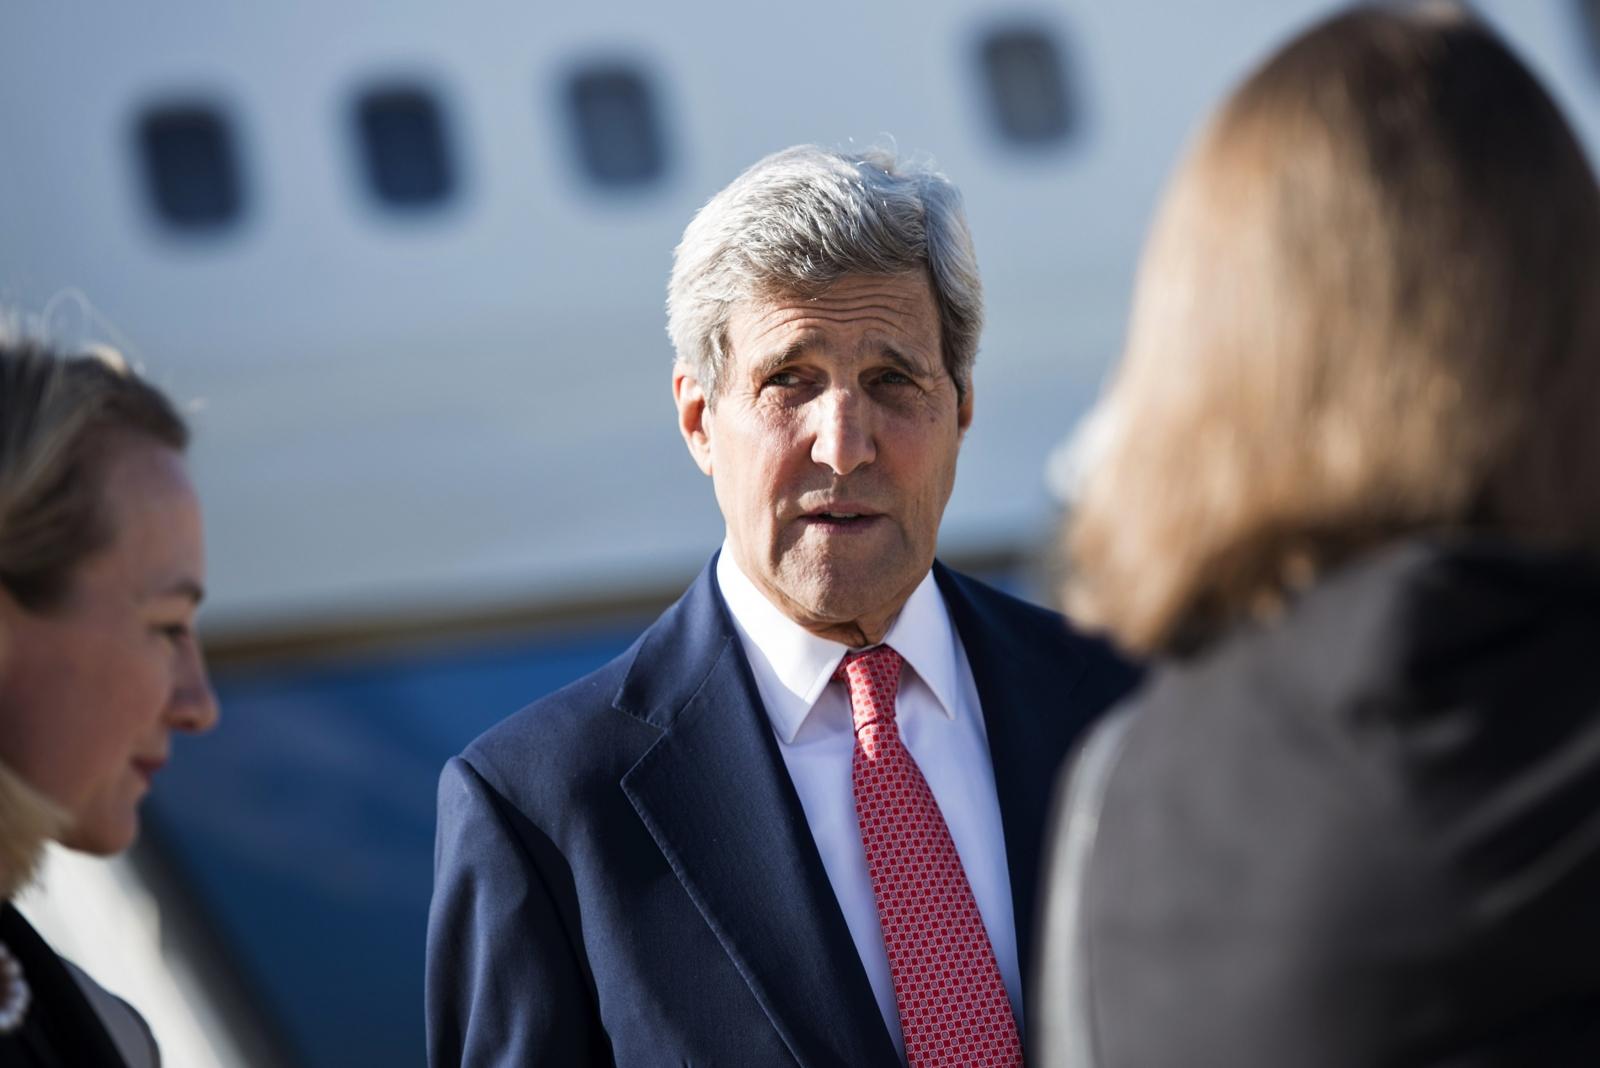 U.S. Secretary of State John Kerry arrives at Queen Alia Airport in Amman